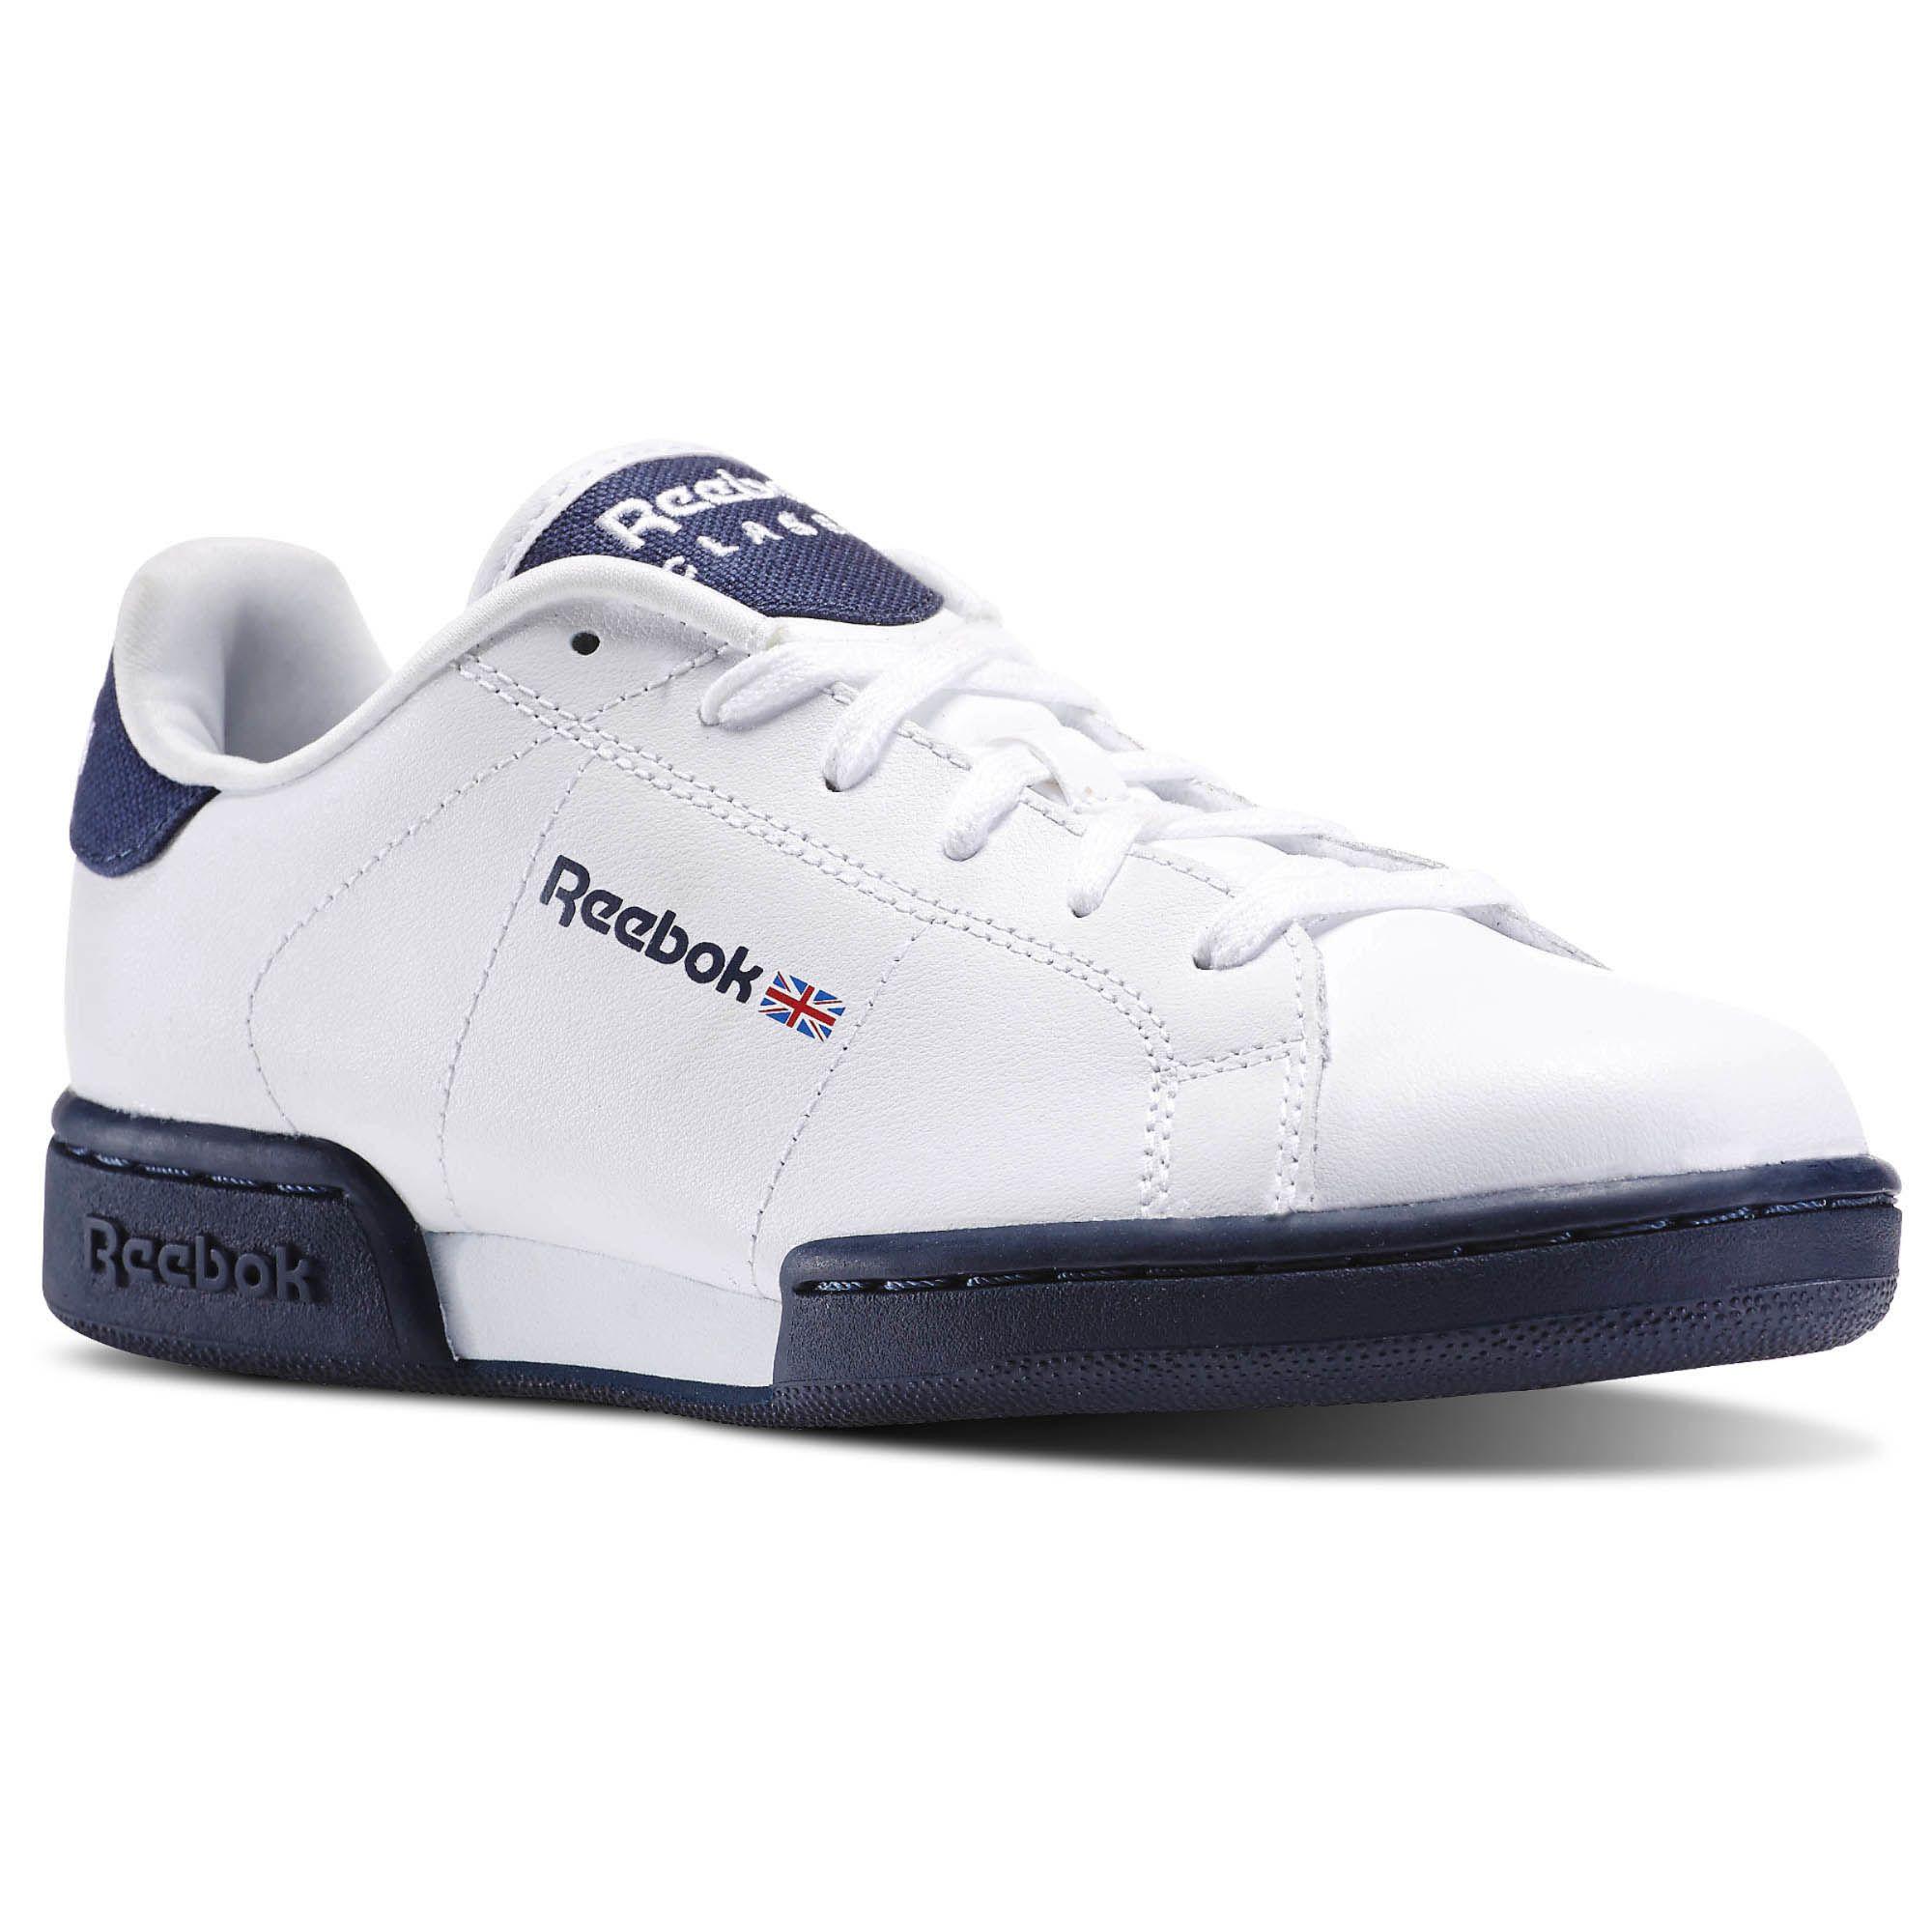 bd112e9fa Sneakers V70395 Zapatillas Reebok Classic NPC II Blanco y Azul